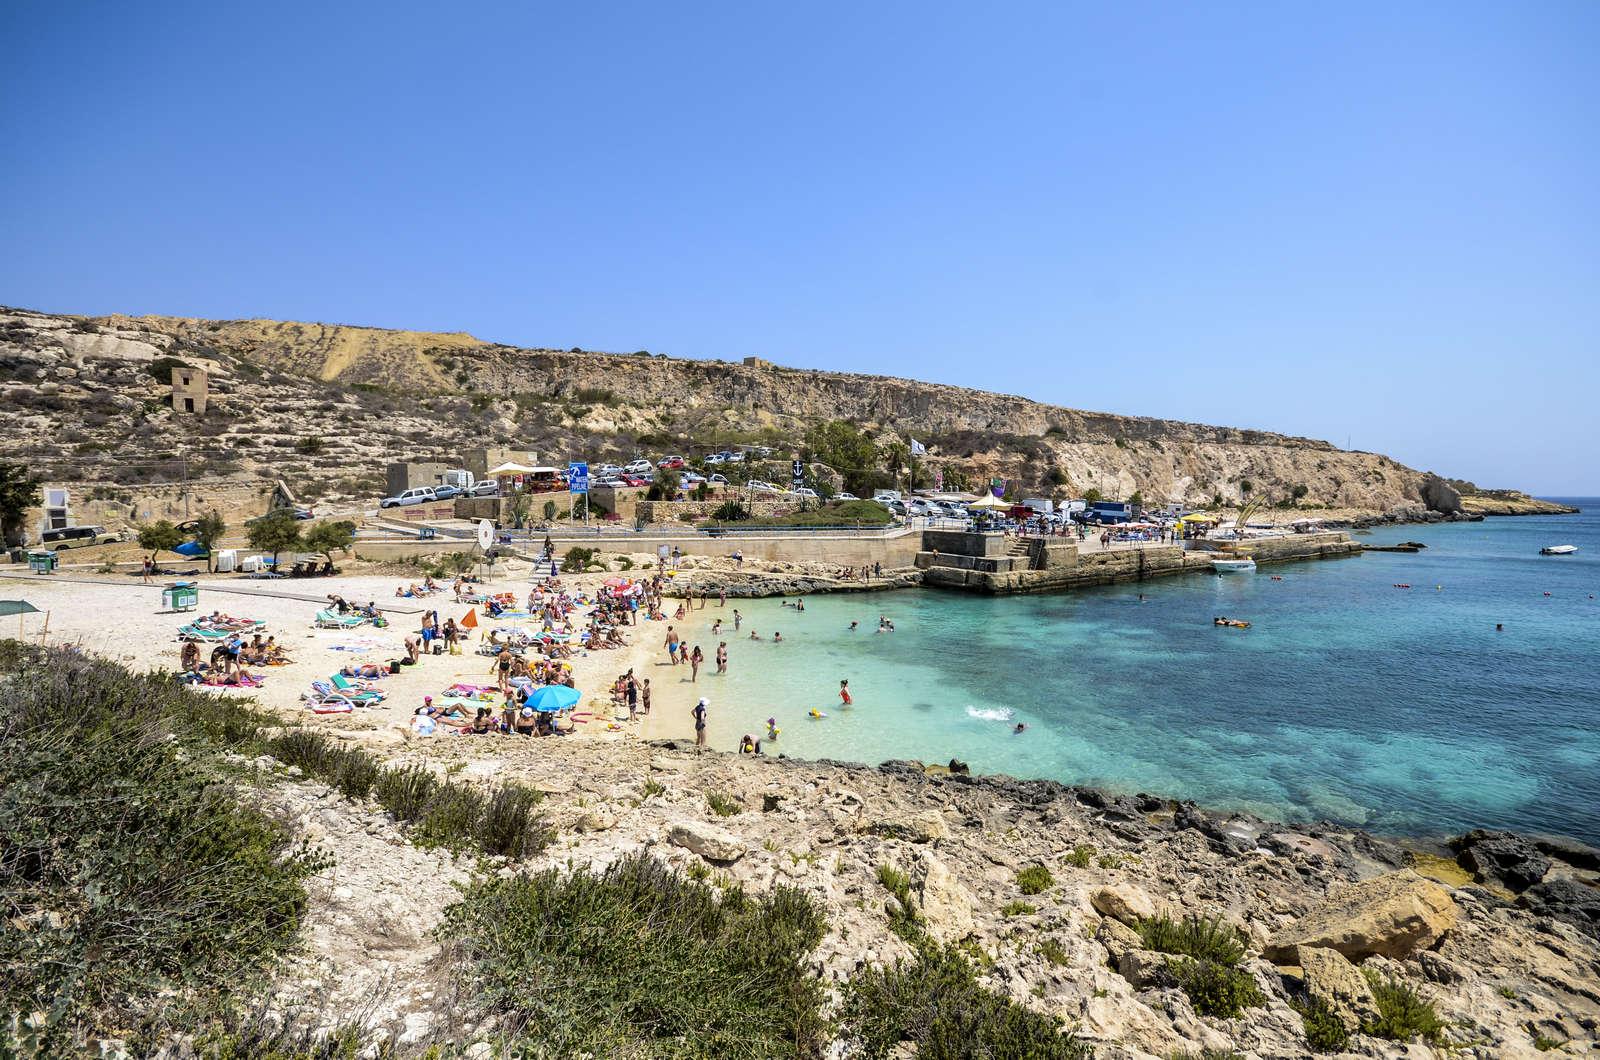 Hondoq Bay - Qala - Gozo